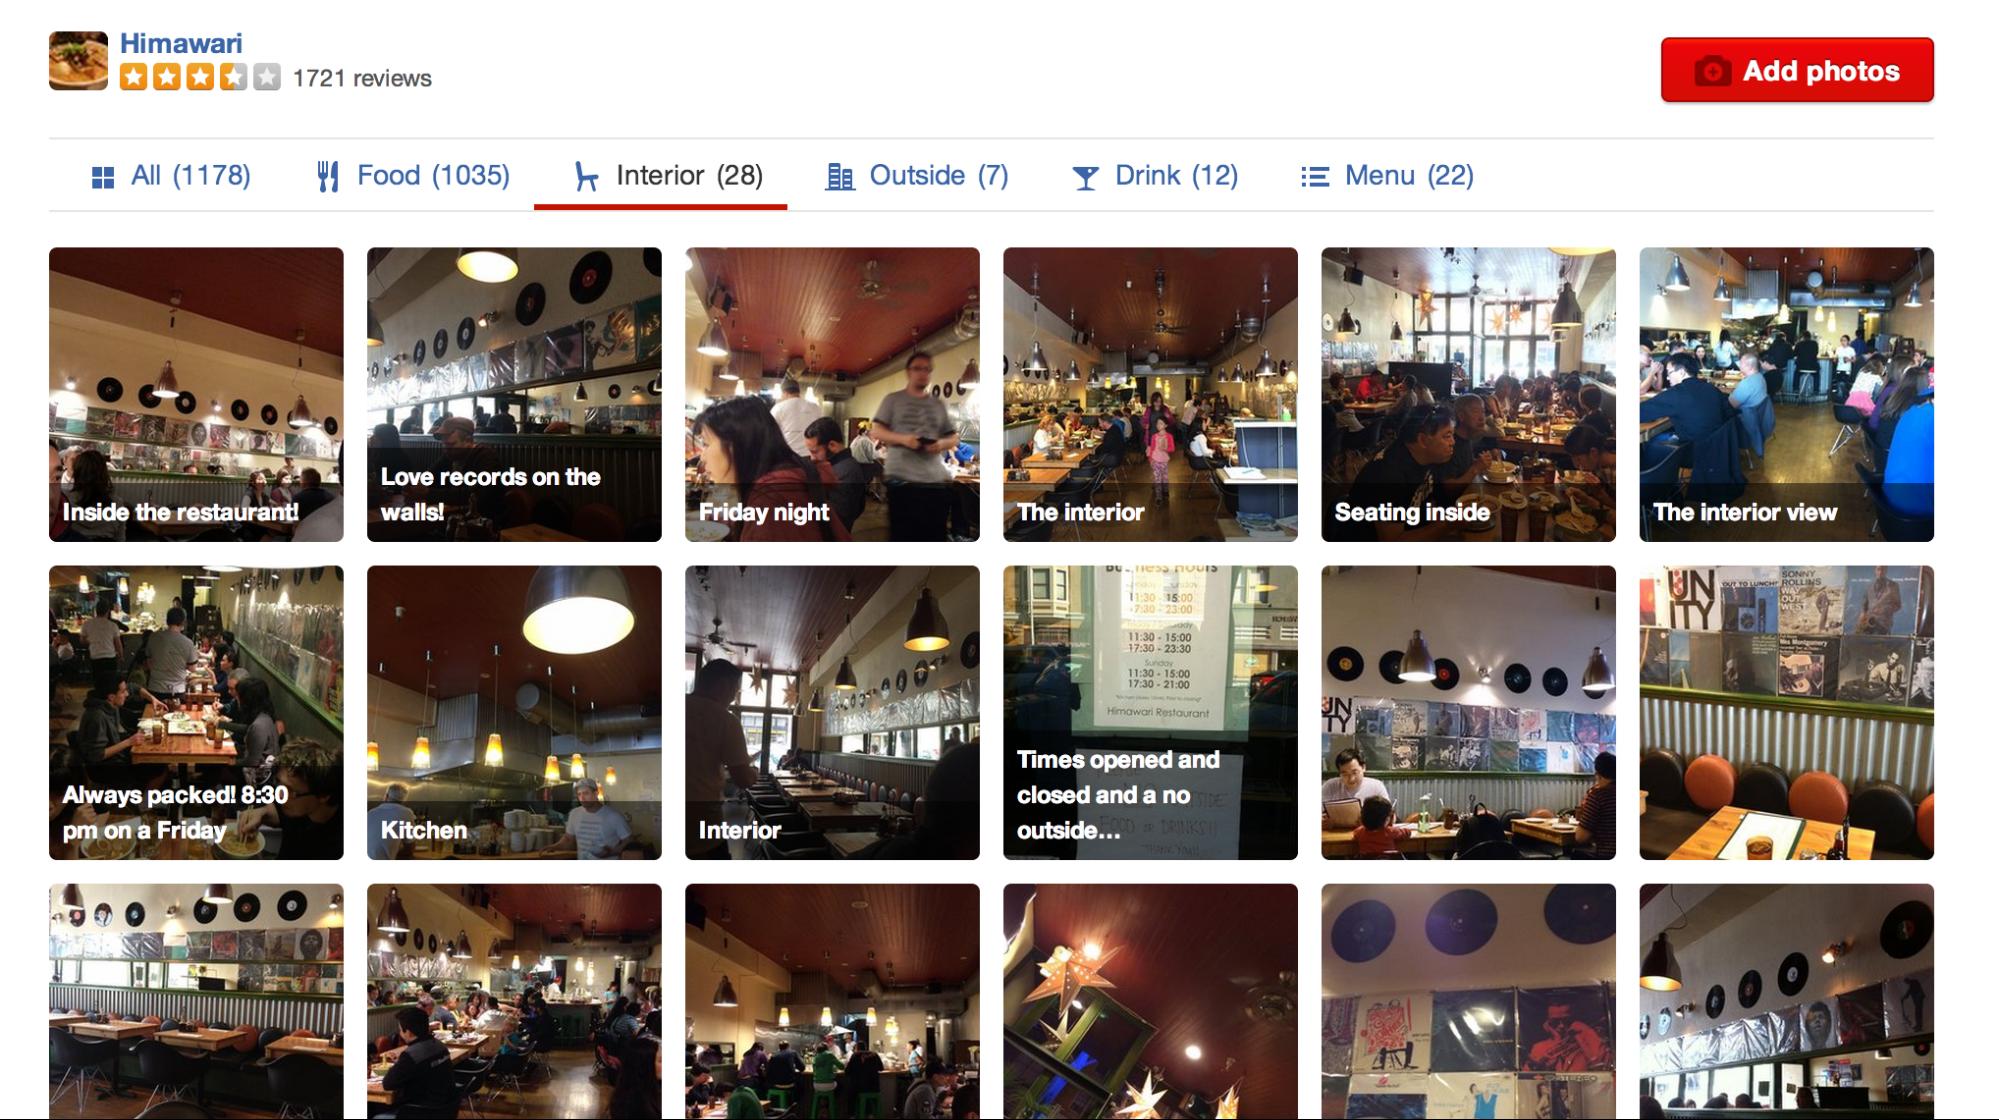 Machine learning applications Yelp image categorization